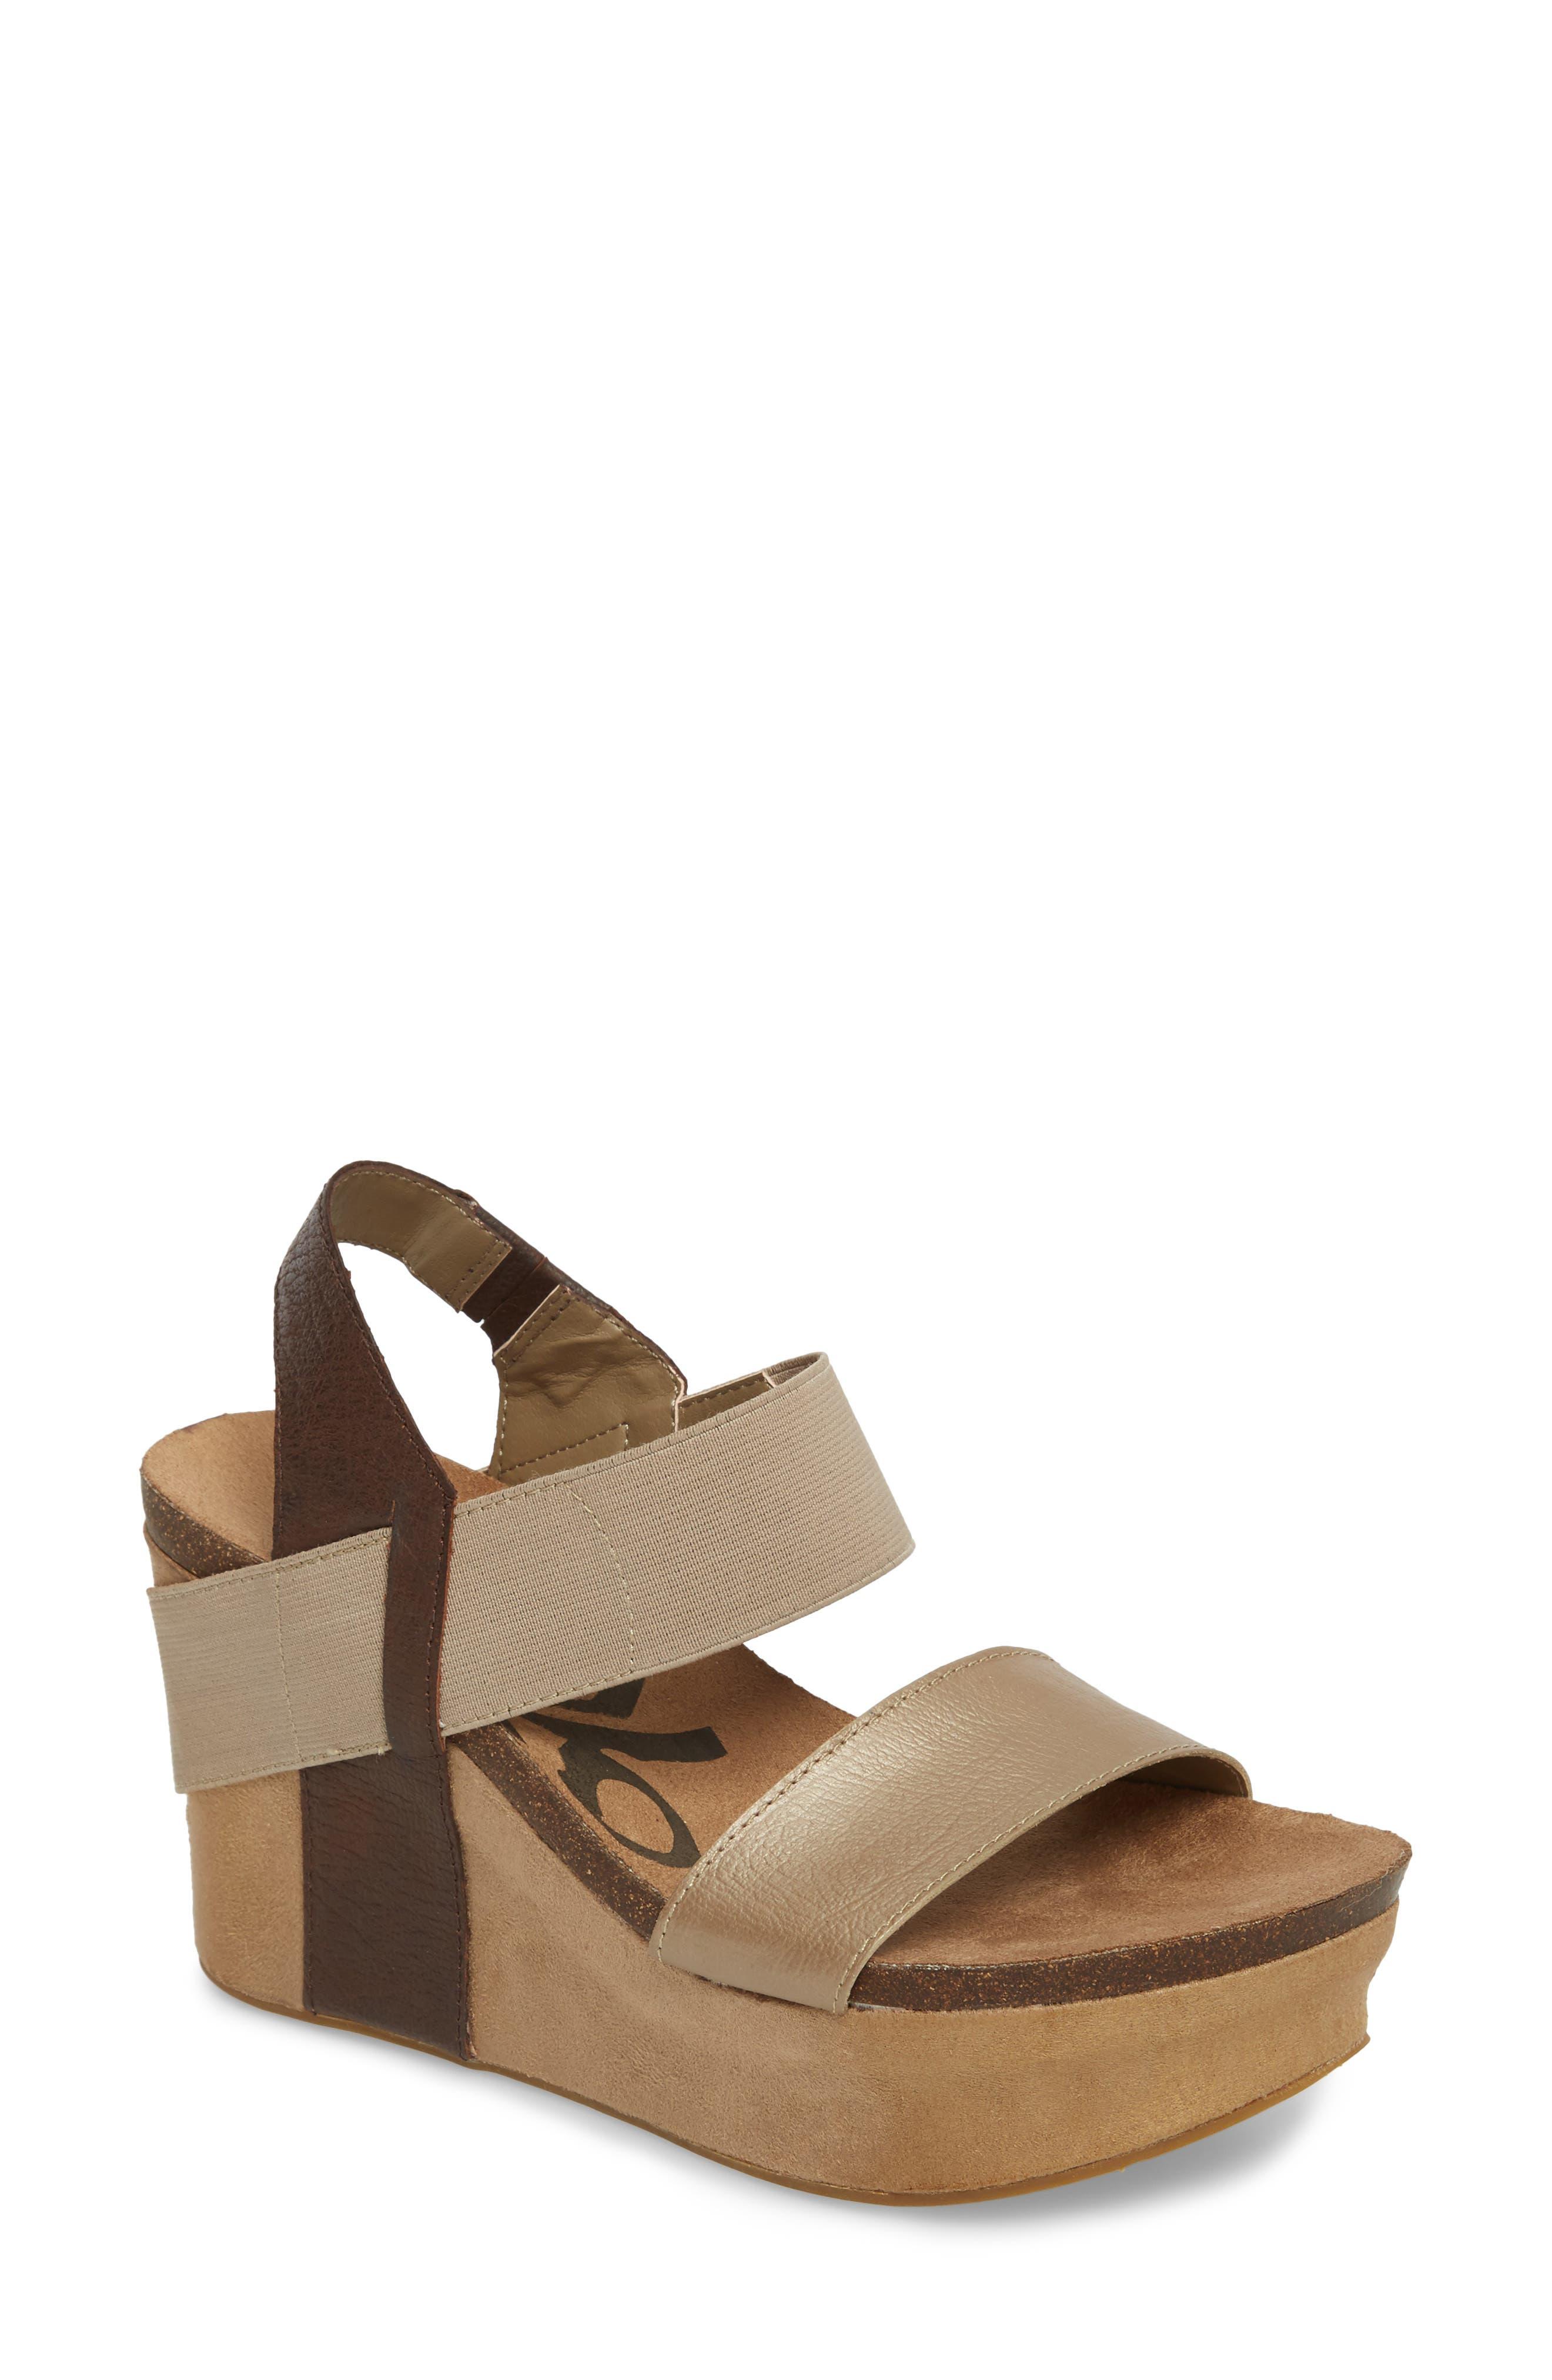 Alternate Image 1 Selected - OTBT 'Bushnell' Wedge Sandal